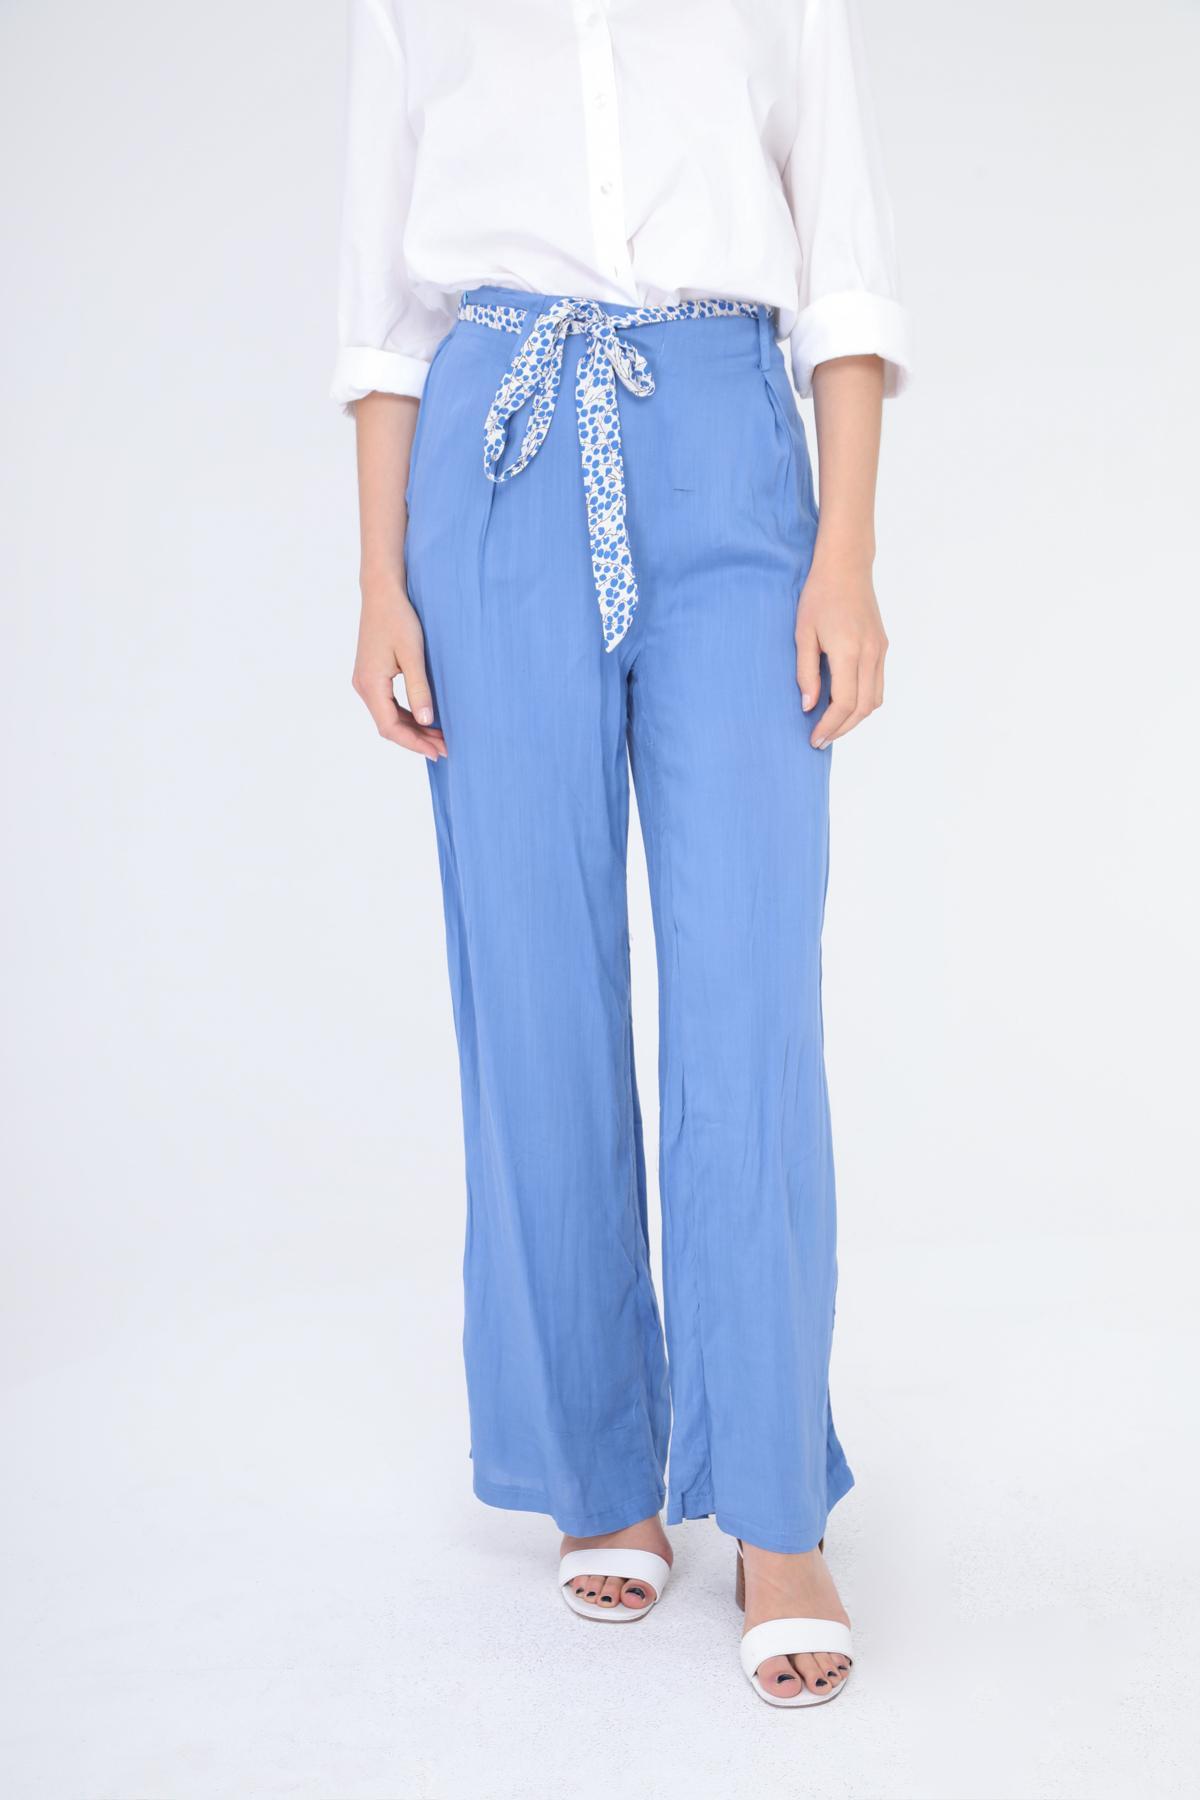 Pantalons Femme Bleu v.code P5291 #c eFashion Paris